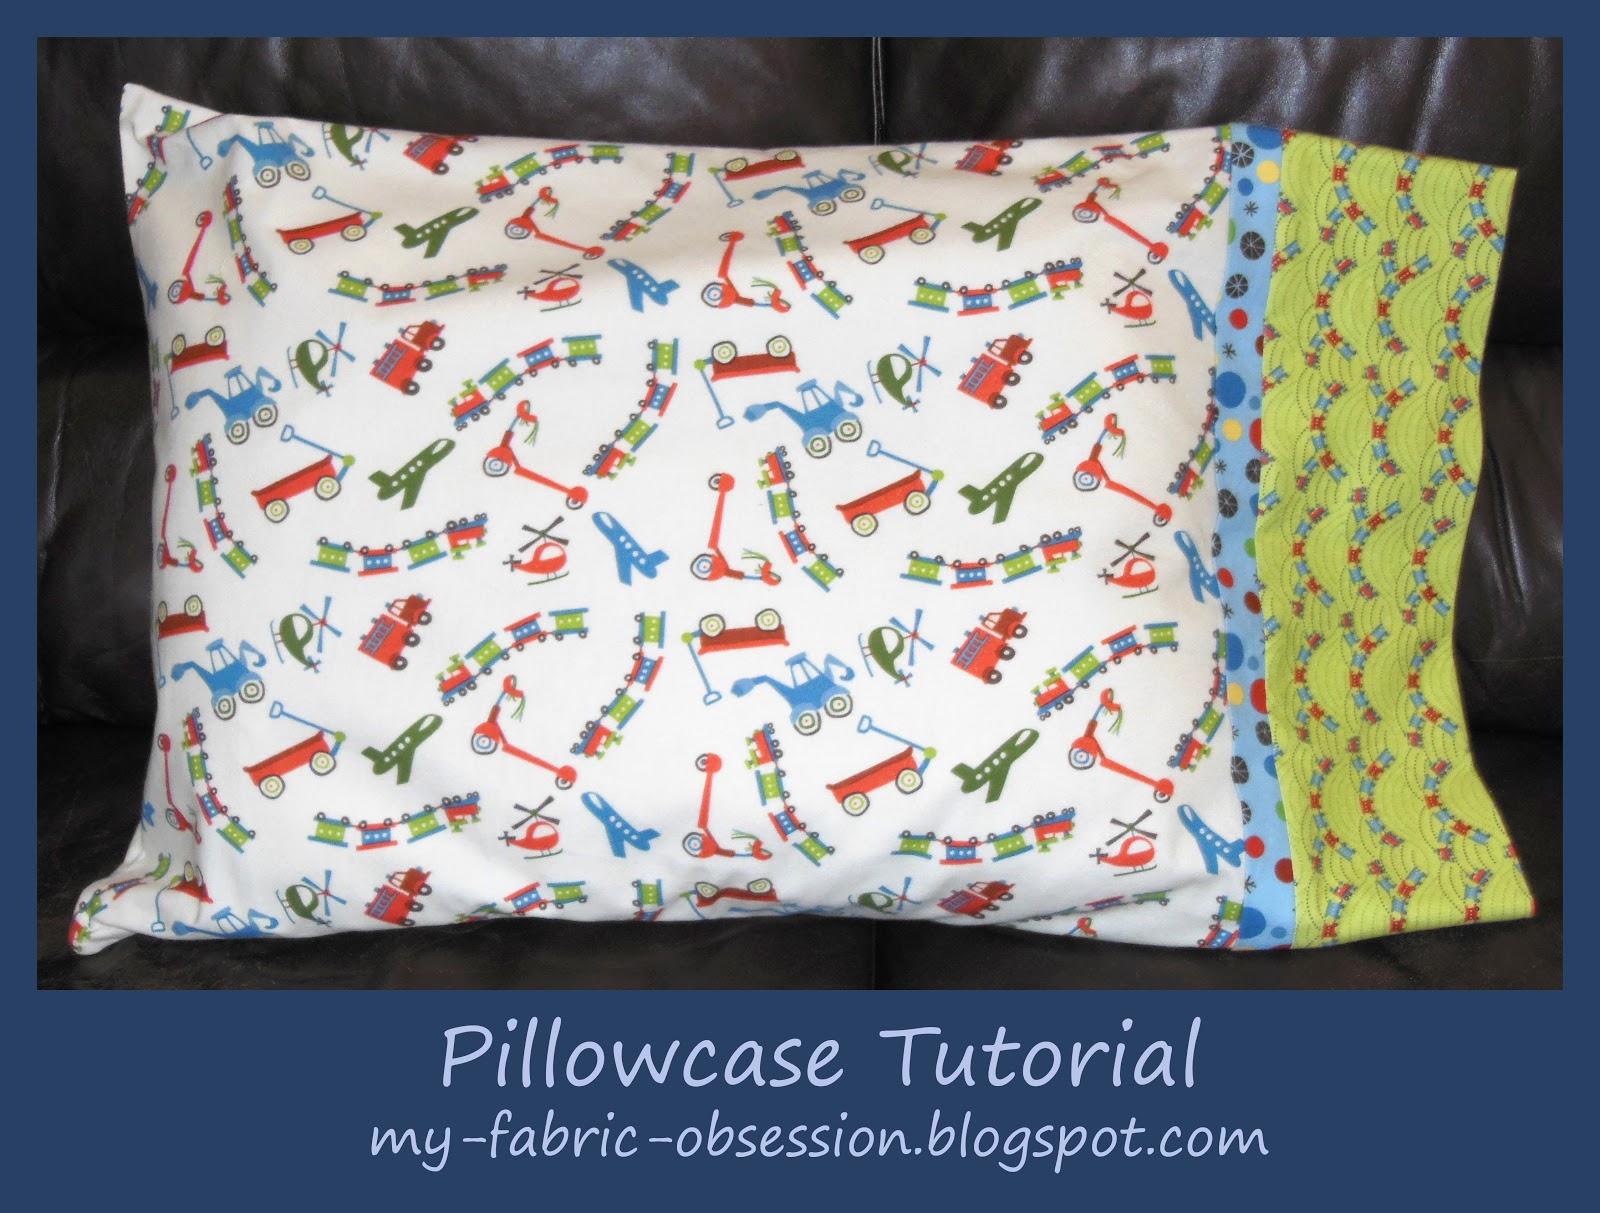 Pillowcase Tutorial Tube: PROJECT IDEA  SUPER QUICK TUBE PILLOW CASE   Janome Life,